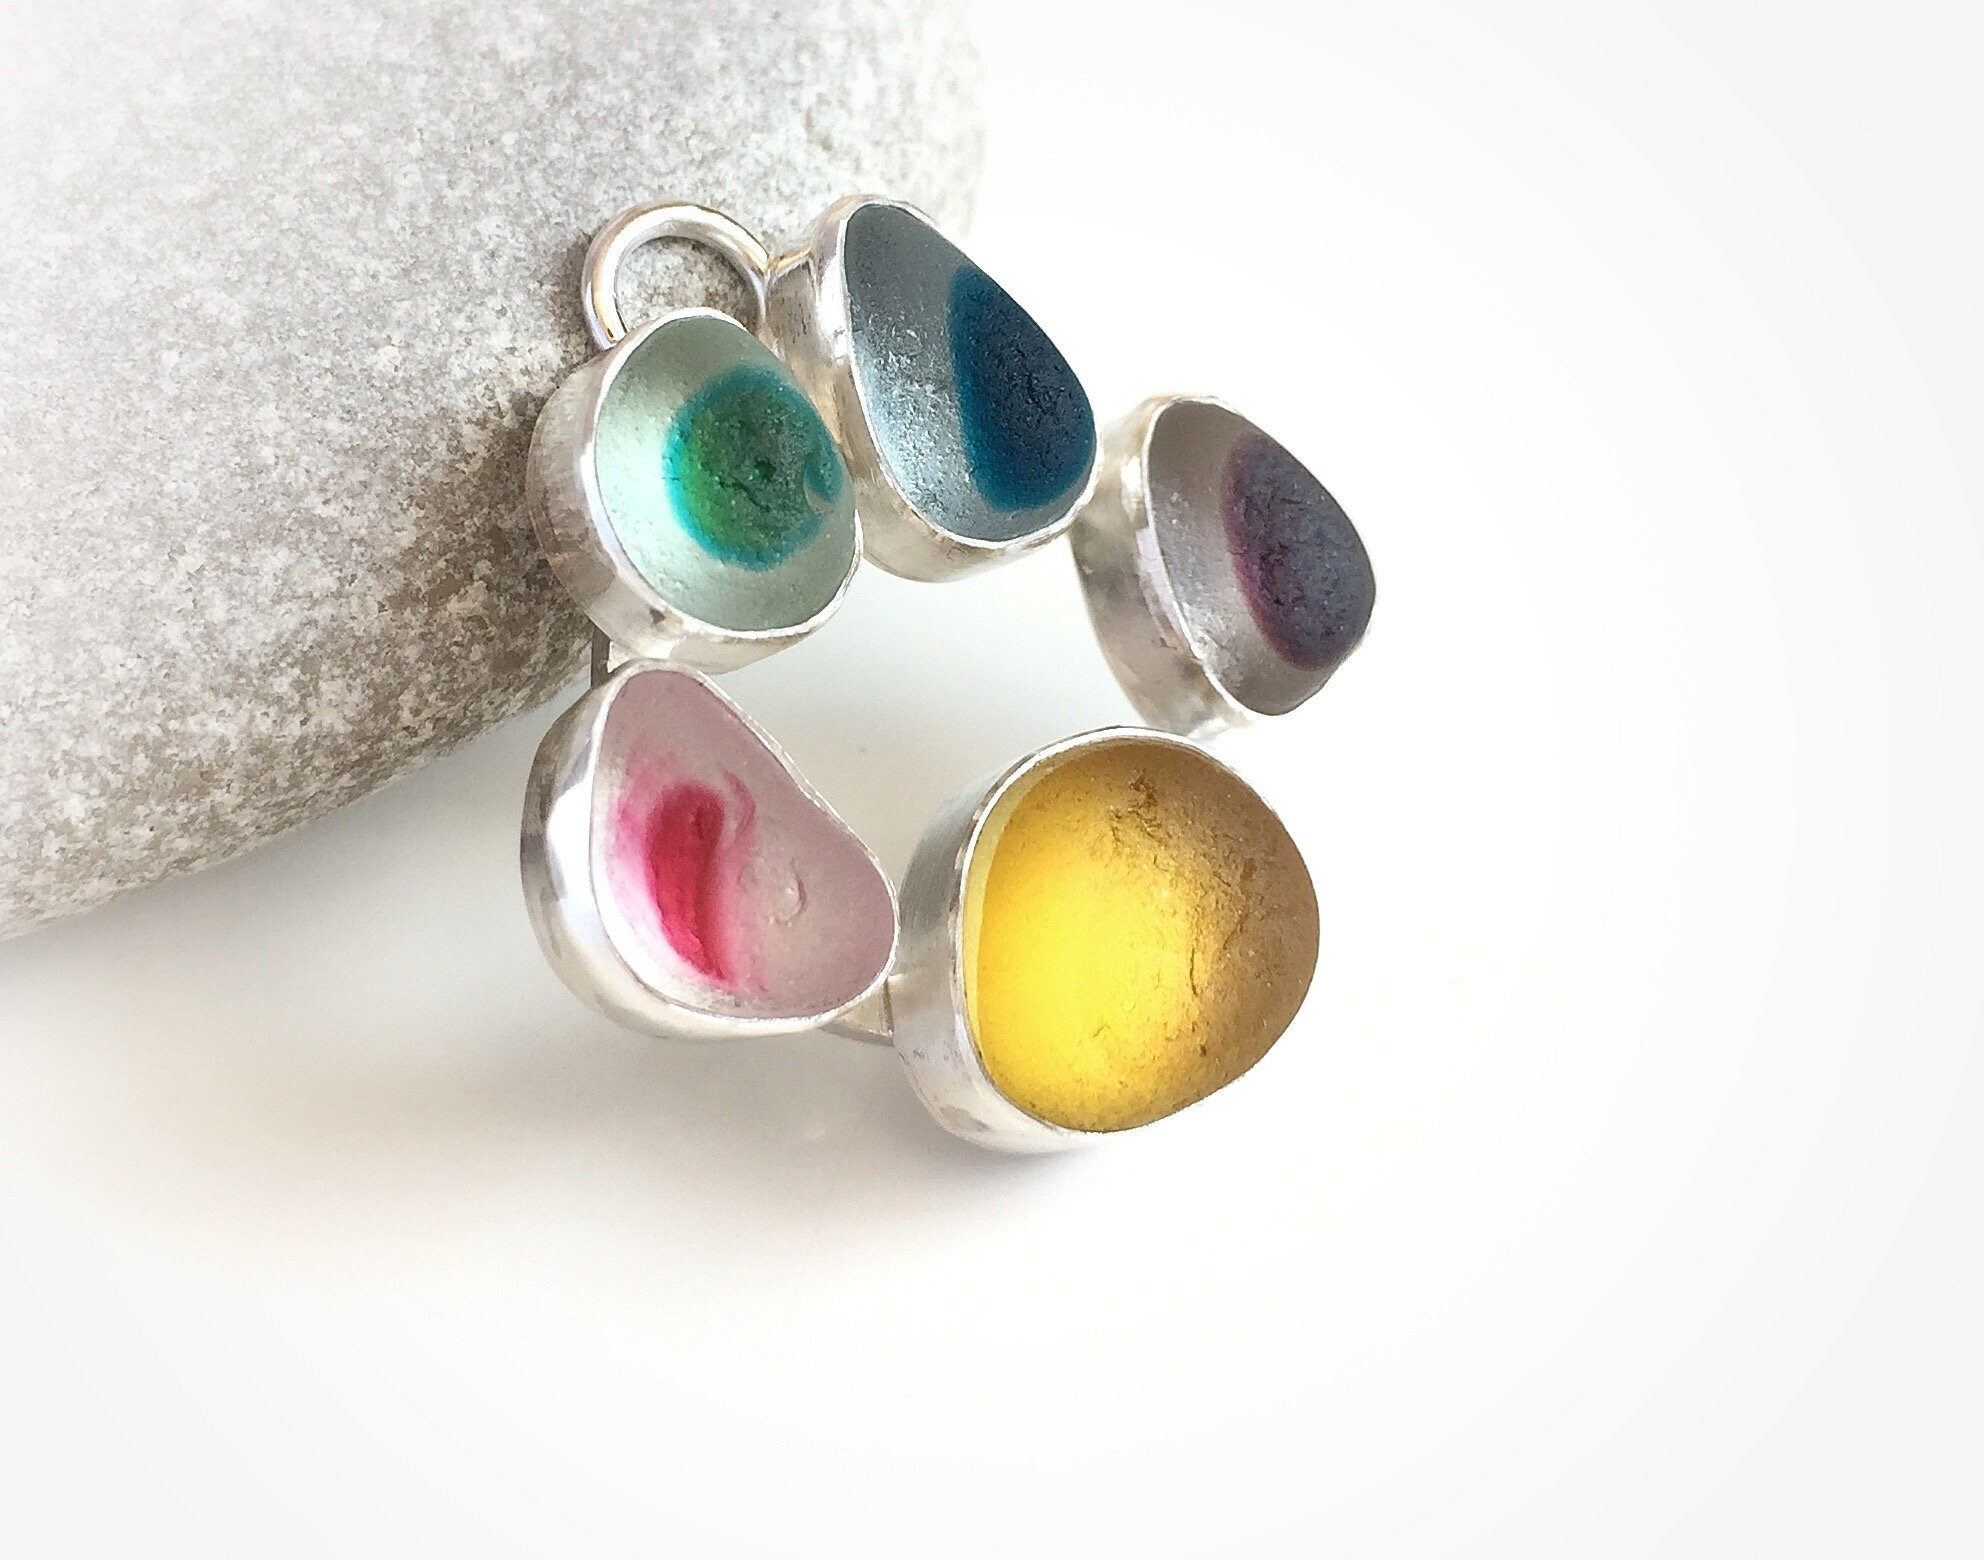 150c39c87 Seaham multi seaglass 'Crossing the Rainbow Bridge' | Etsy